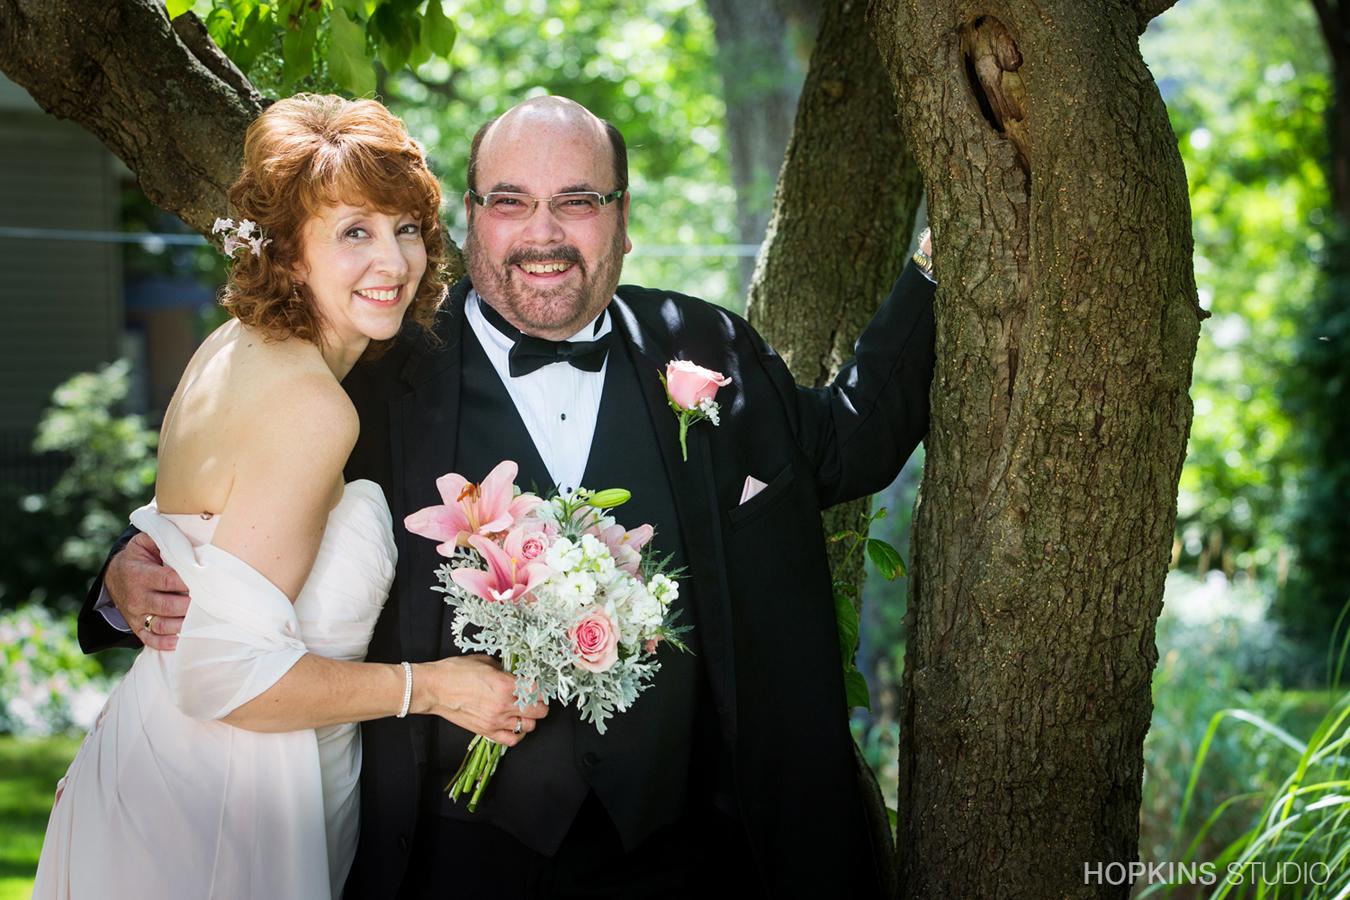 wedding-photography-Tippicanoe-Place-Southbend-Indiana-weddings_57.jpg